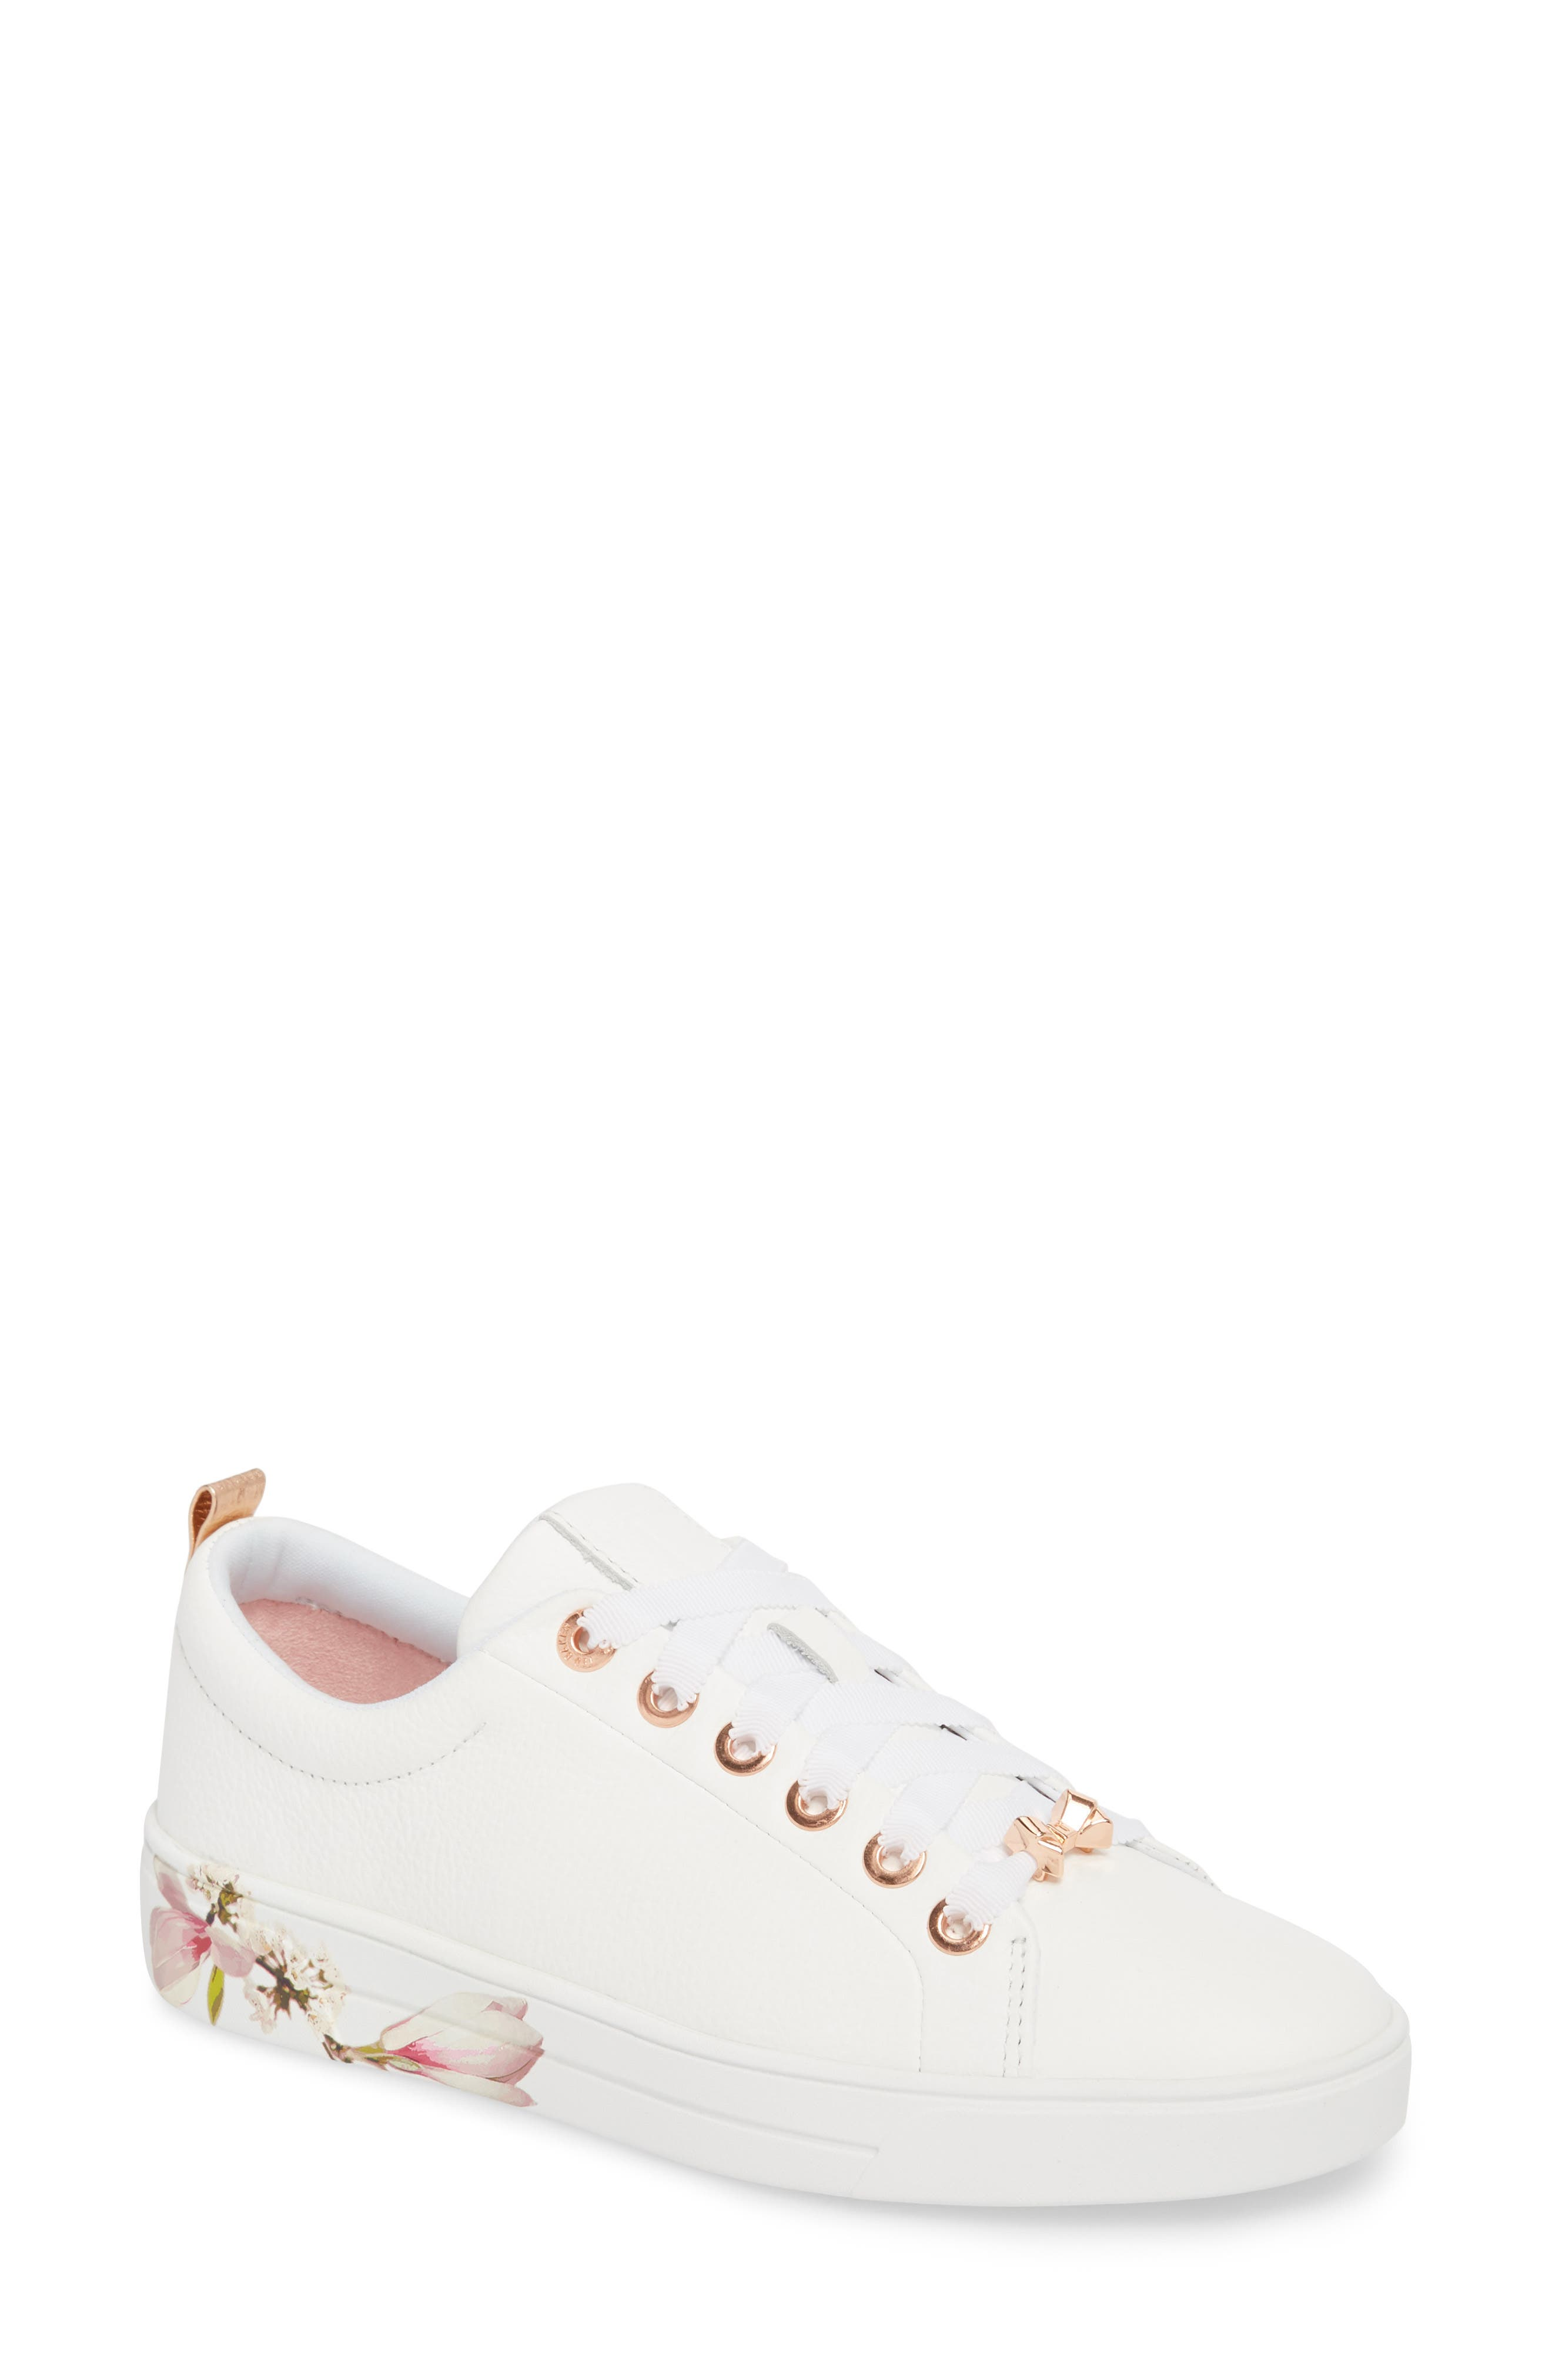 Kelleip Sneaker,                         Main,                         color, WHITE/ PALACE GARDENS